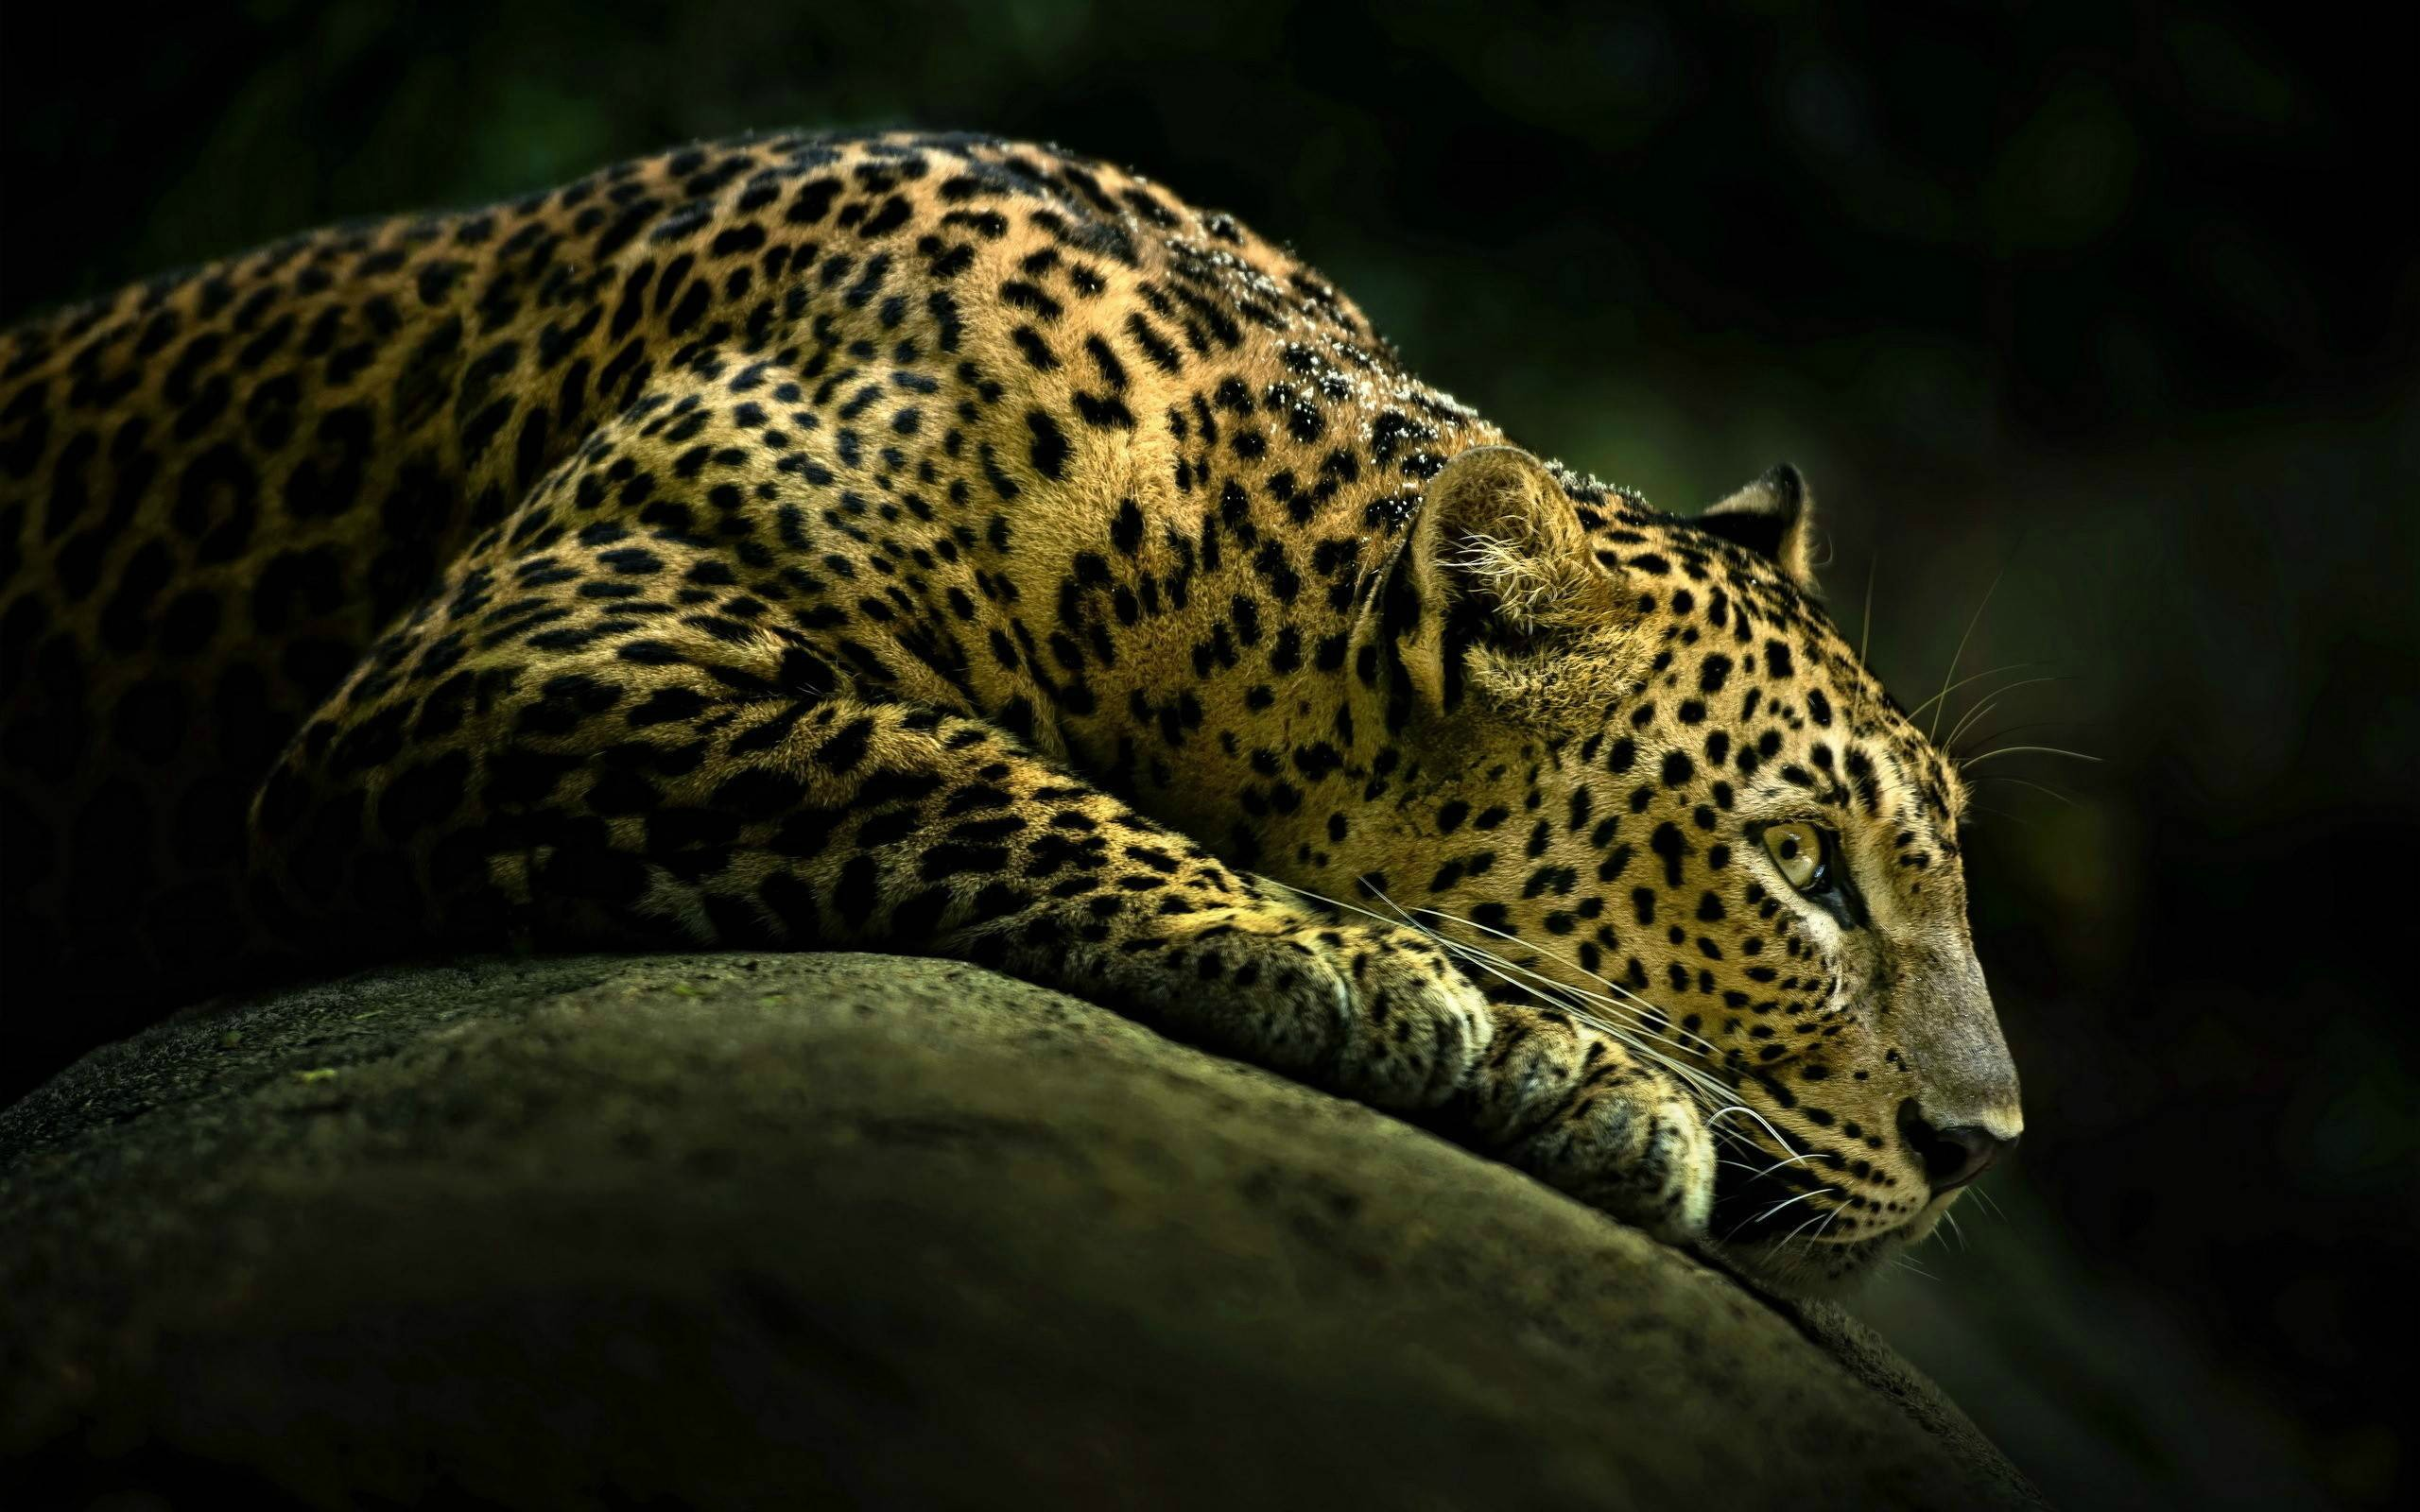 Ягуар хищник взгляд камни  № 3657950 бесплатно